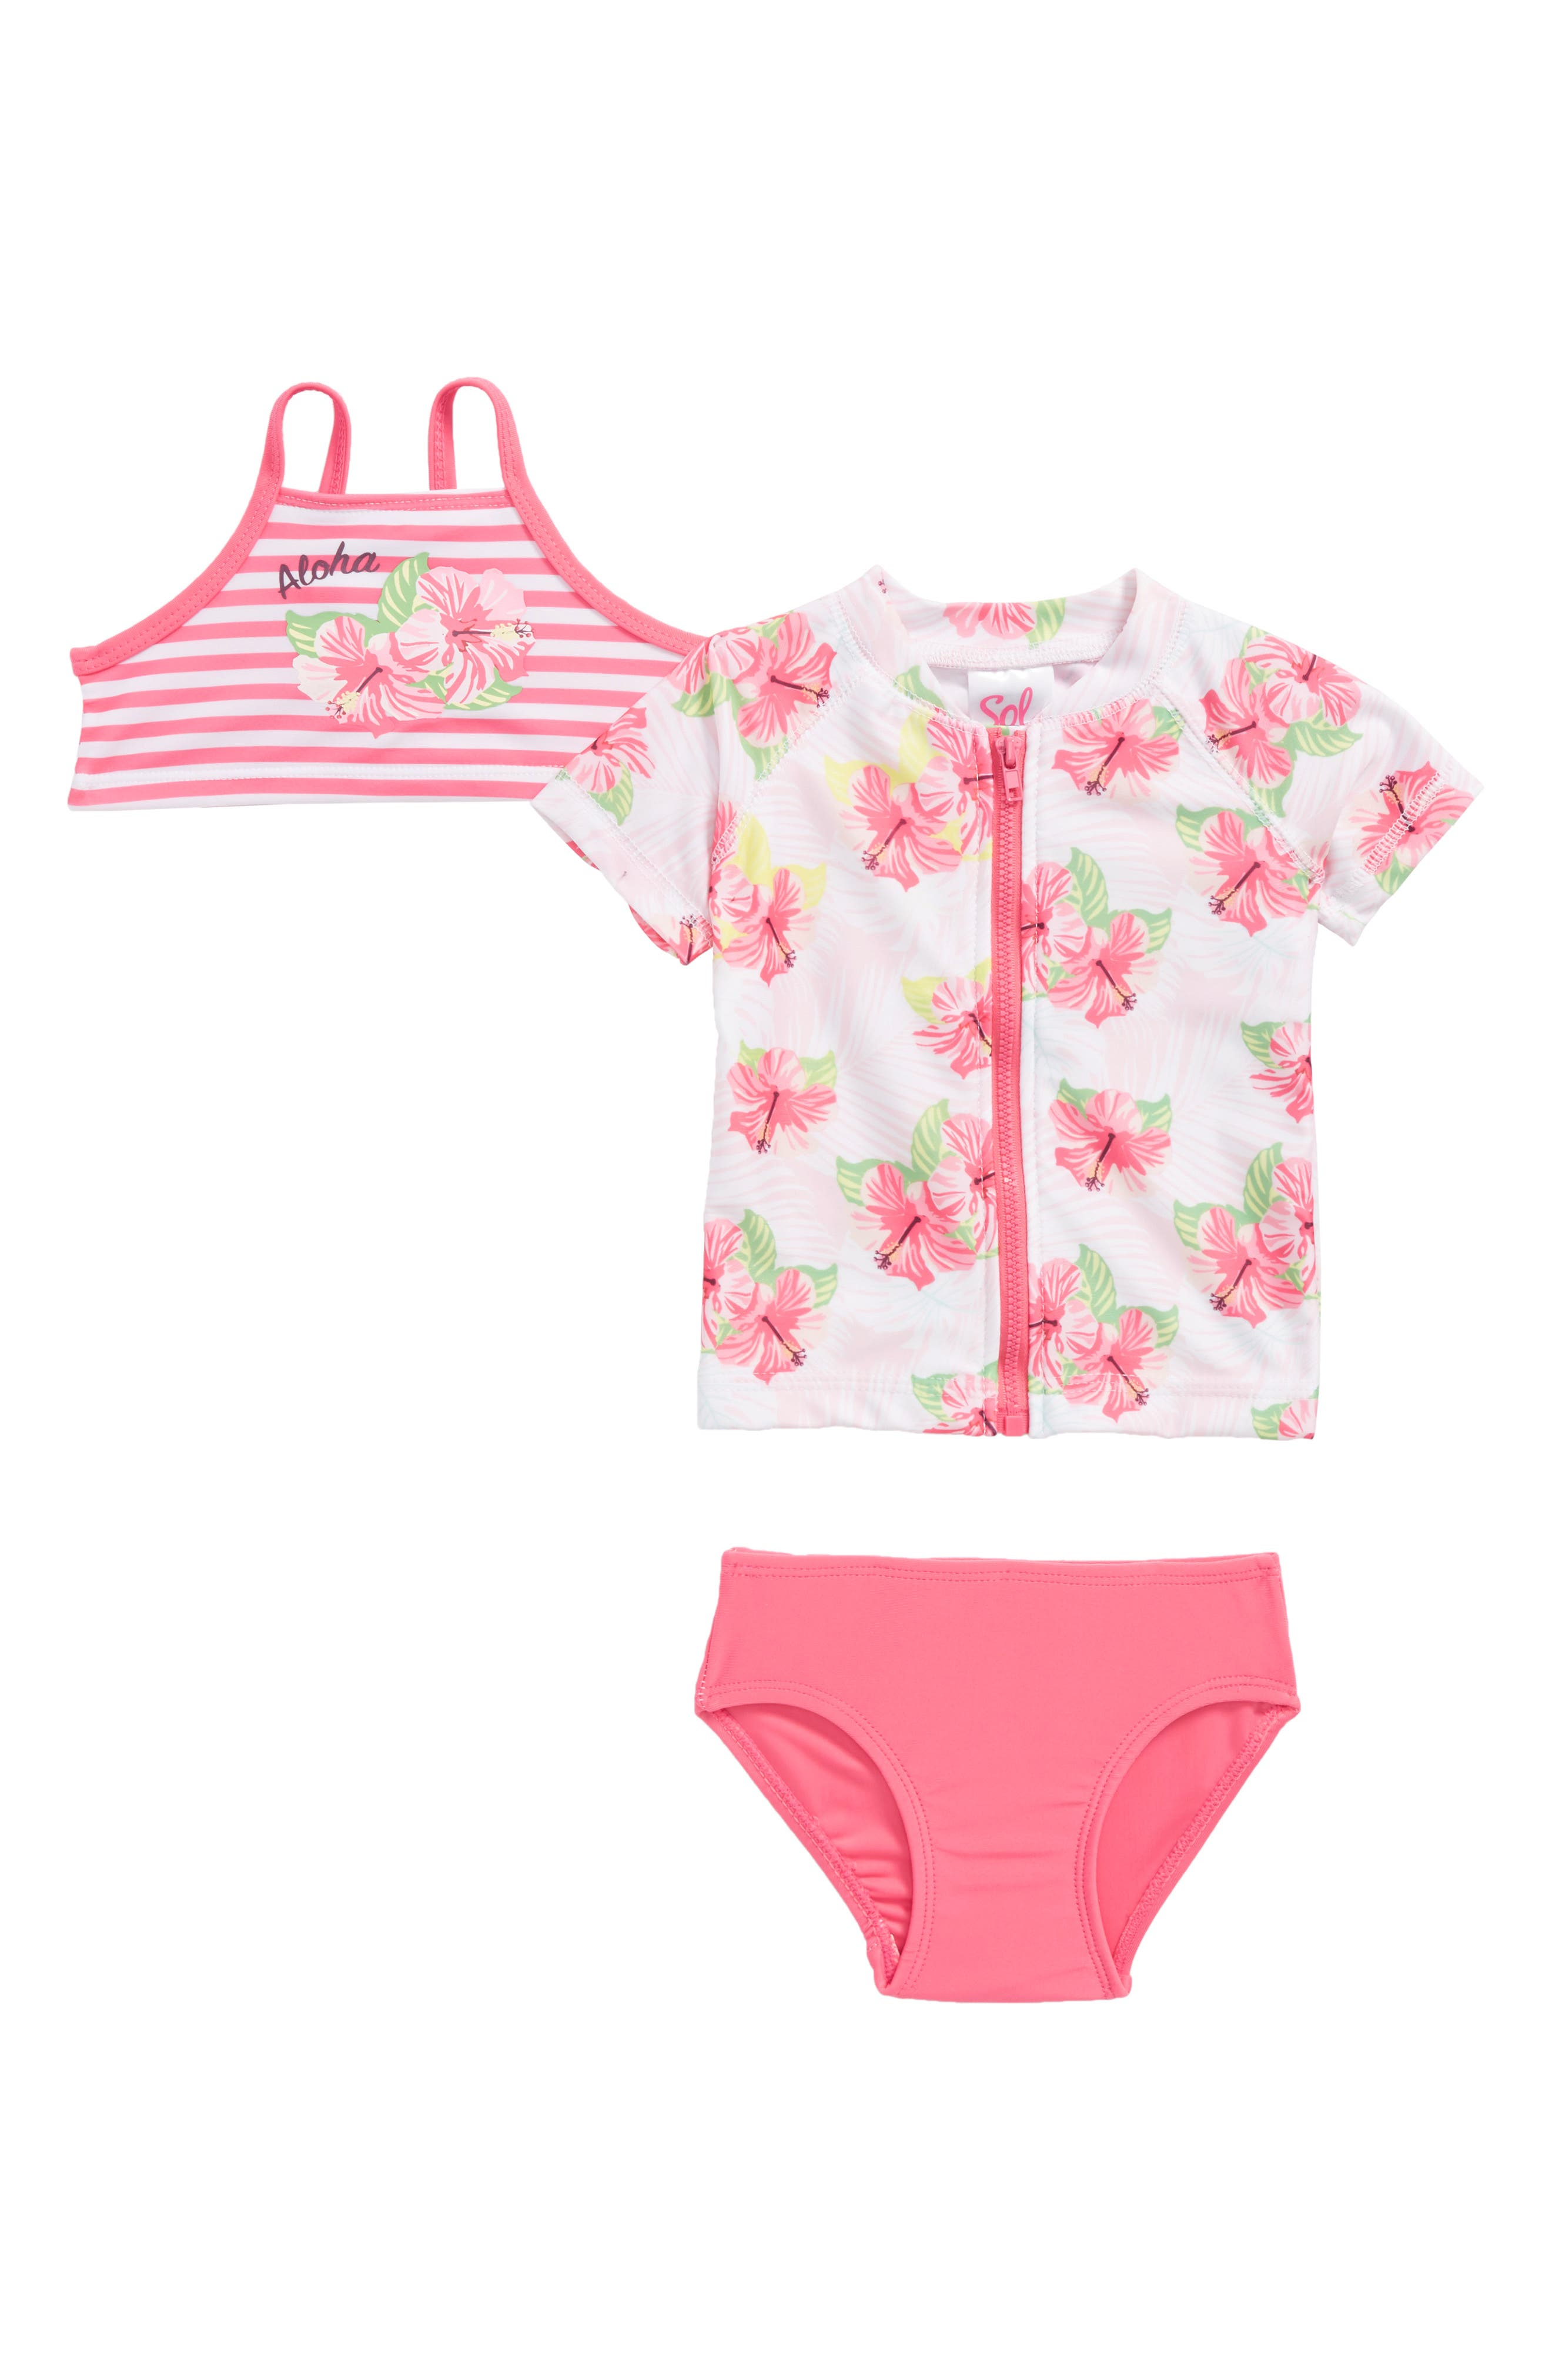 Main Image - Sol Swim Honolulu Two-Piece Swimsuit with Rashguard (Baby Girls)